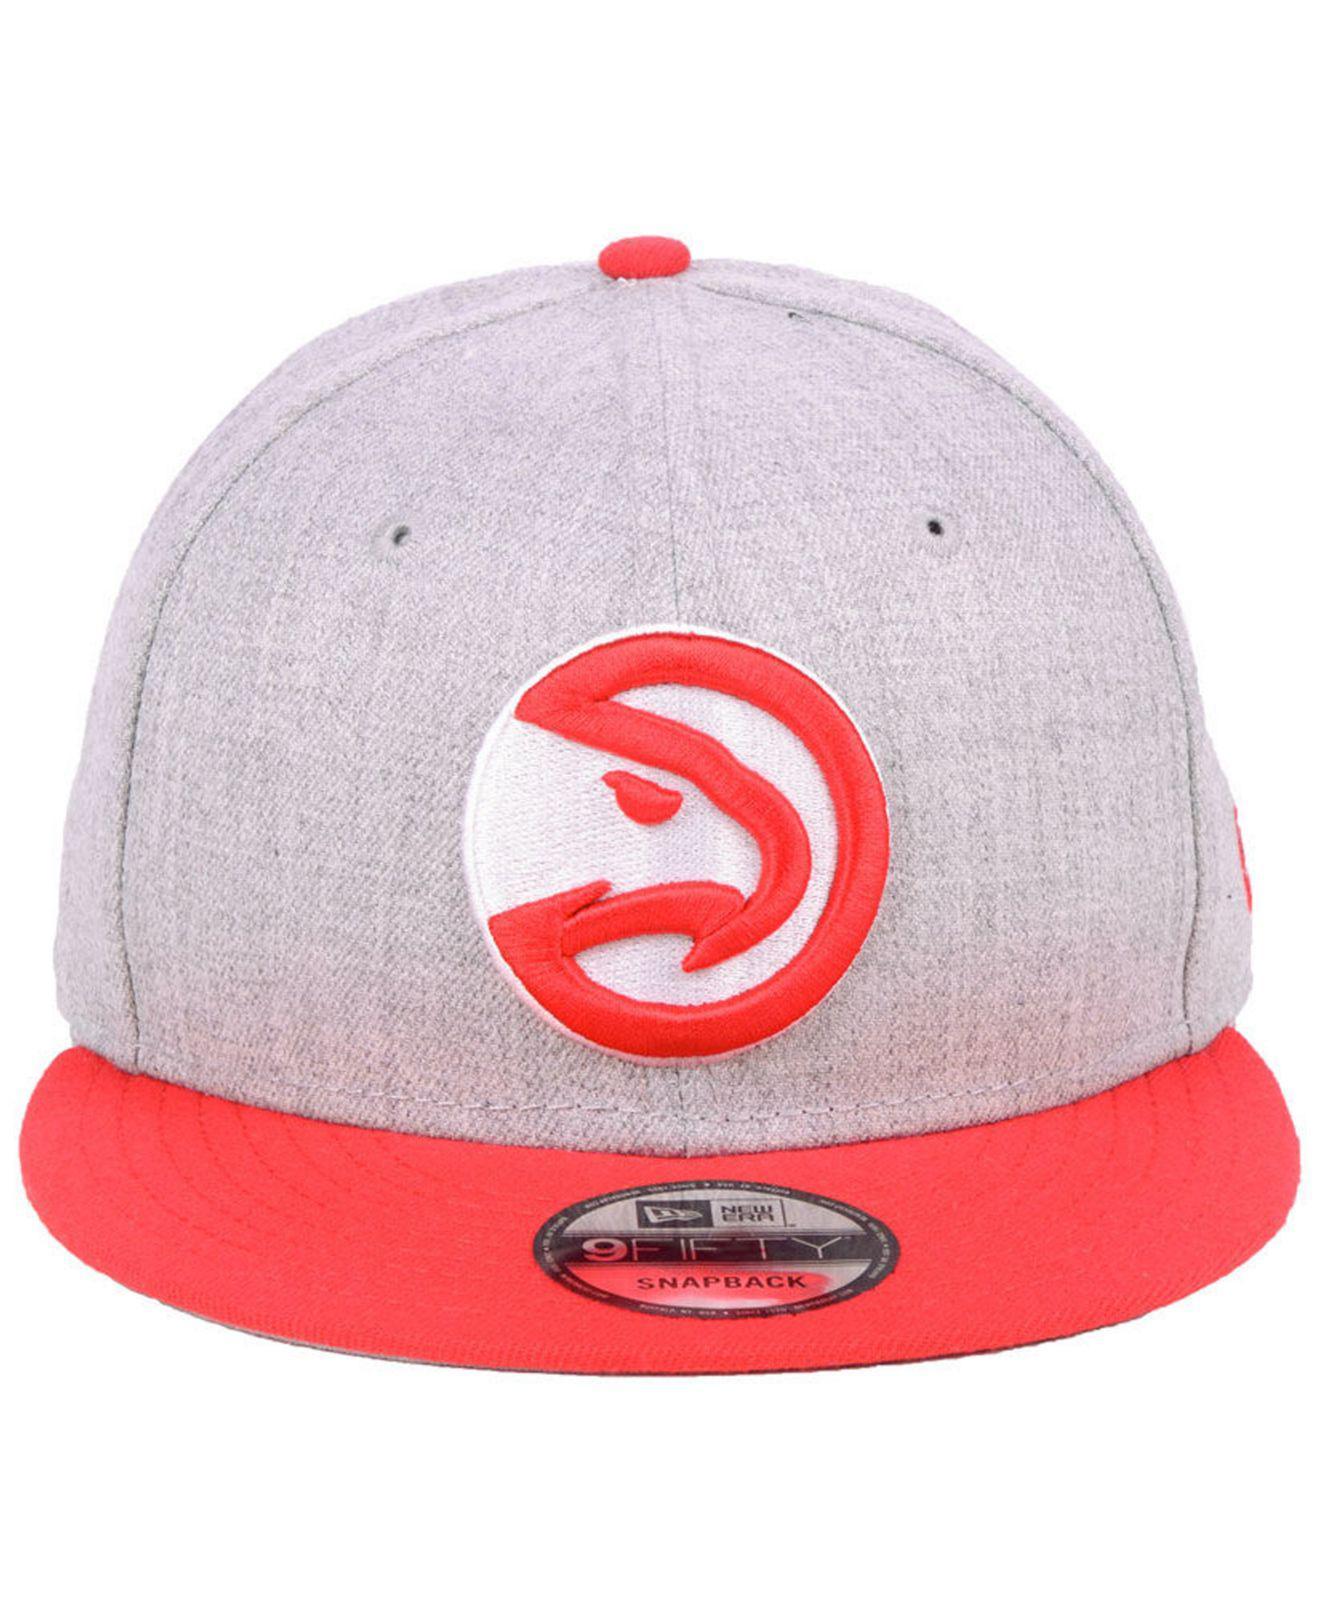 best loved af345 ac2ea hot lyst ktz atlanta hawks heather gray 9fifty snapback cap in red for men  41e89 921b3